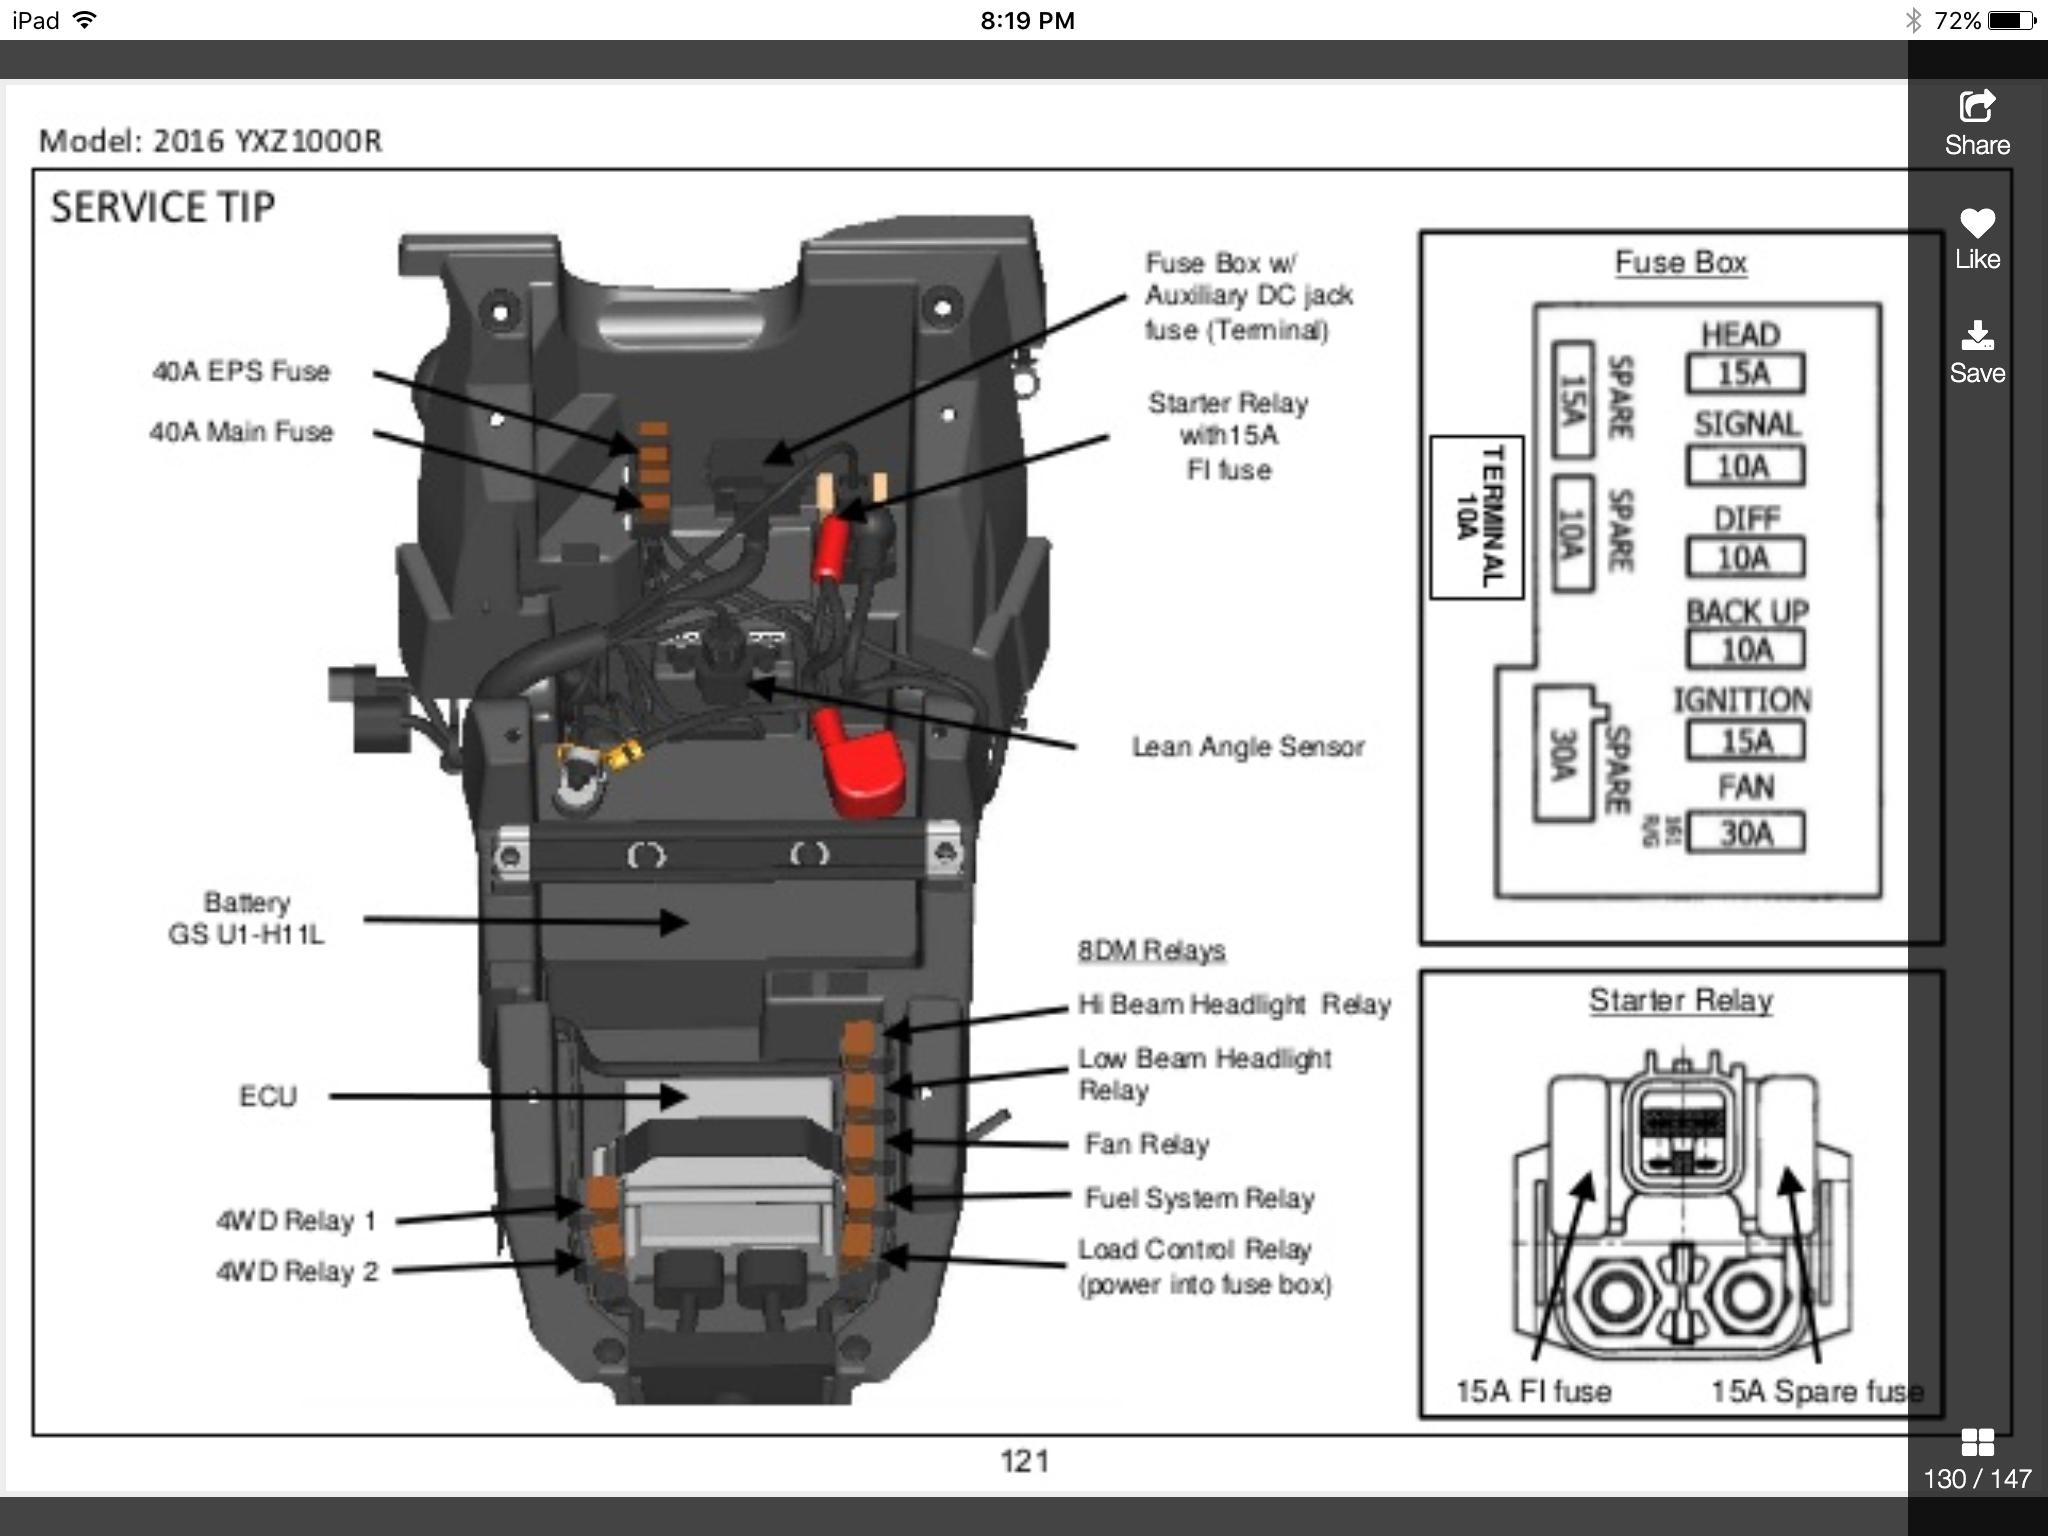 10 Amp Fuse Box Archive Of Automotive Wiring Diagram 2005 Gmc Envoy Fuses Licens Plate Back Ligth Terminal Rh Yxztalk Com